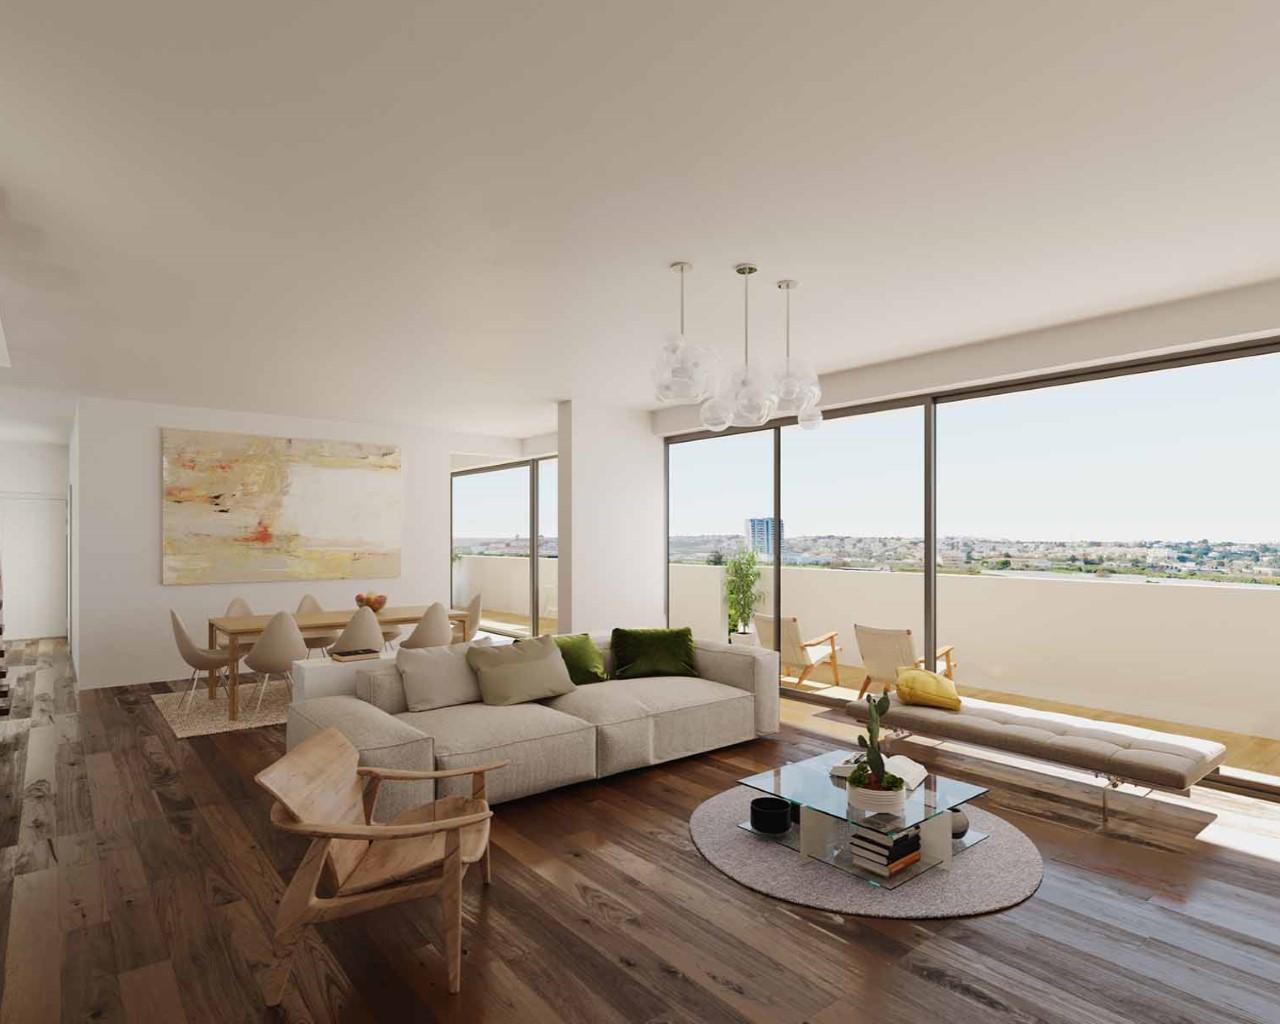 Living room - option walnit wood